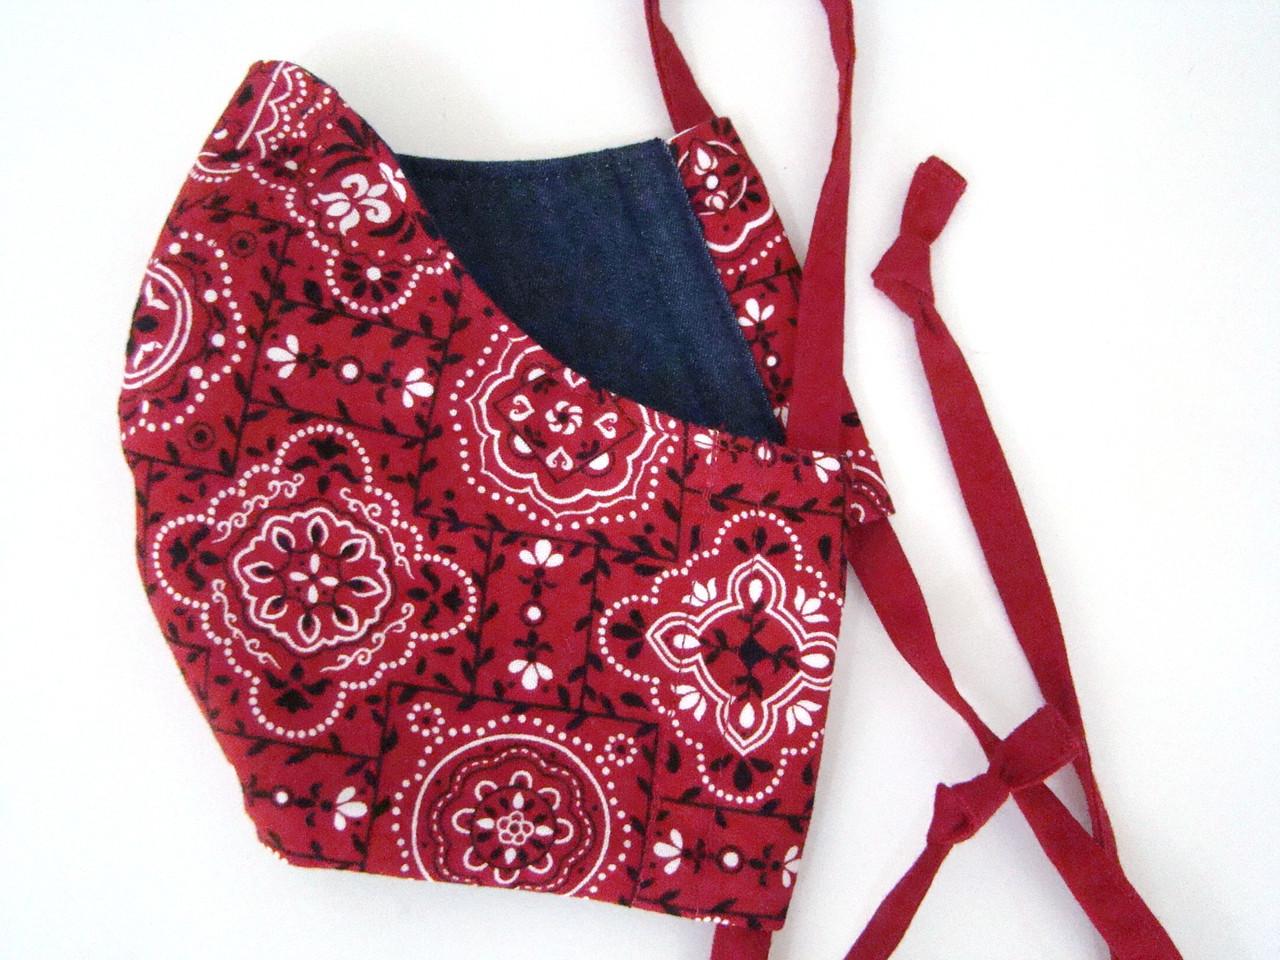 Red Bandana Print with Dark Wash Denim